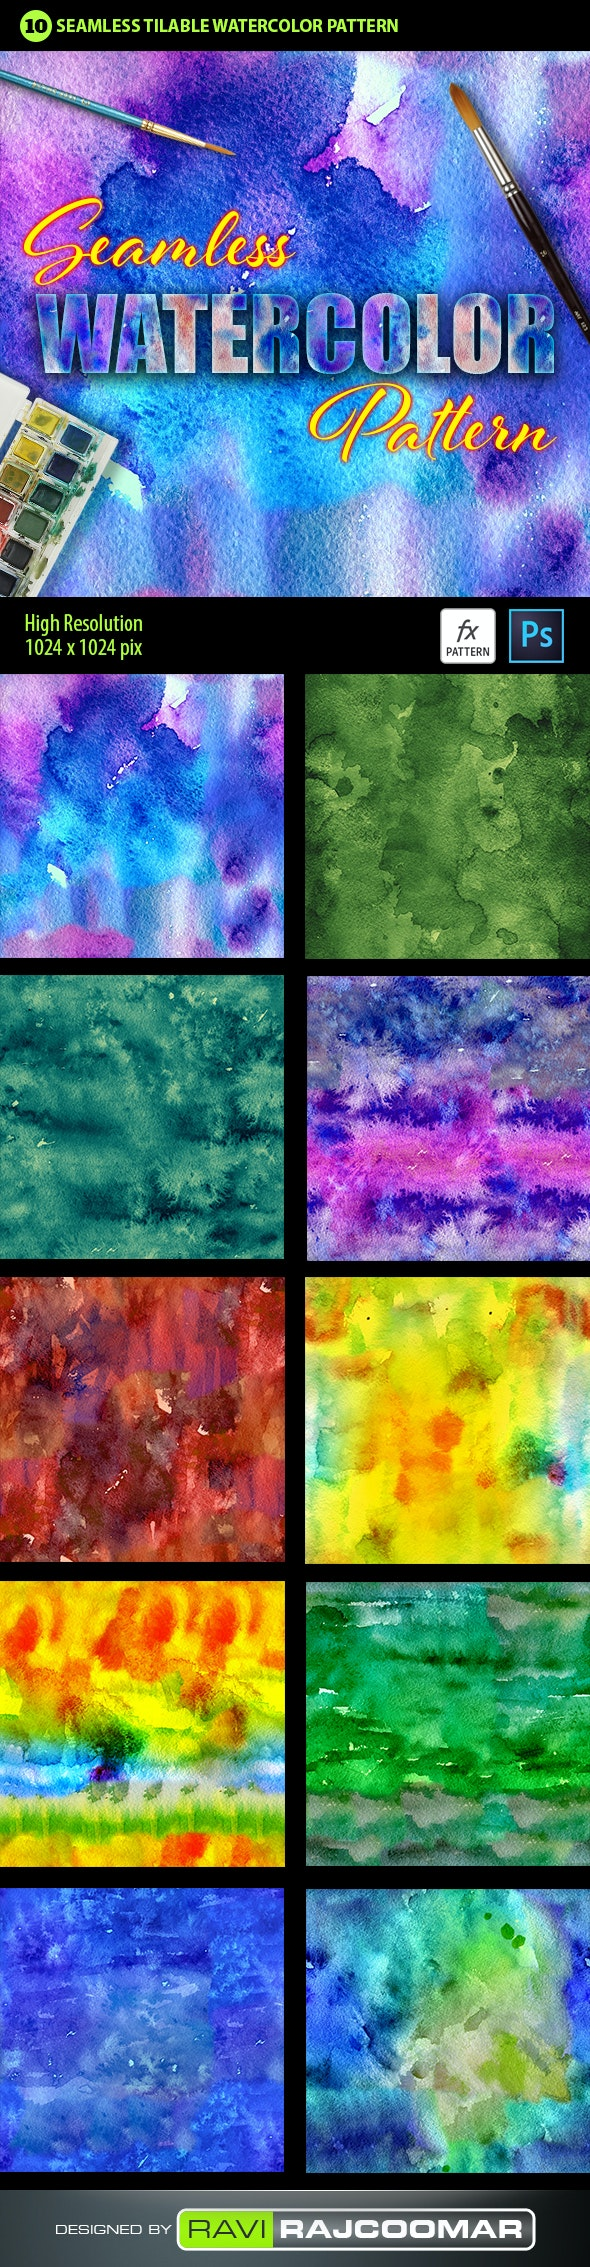 Watercolor Photoshop Pattern Vol.3 - Textures / Fills / Patterns Photoshop